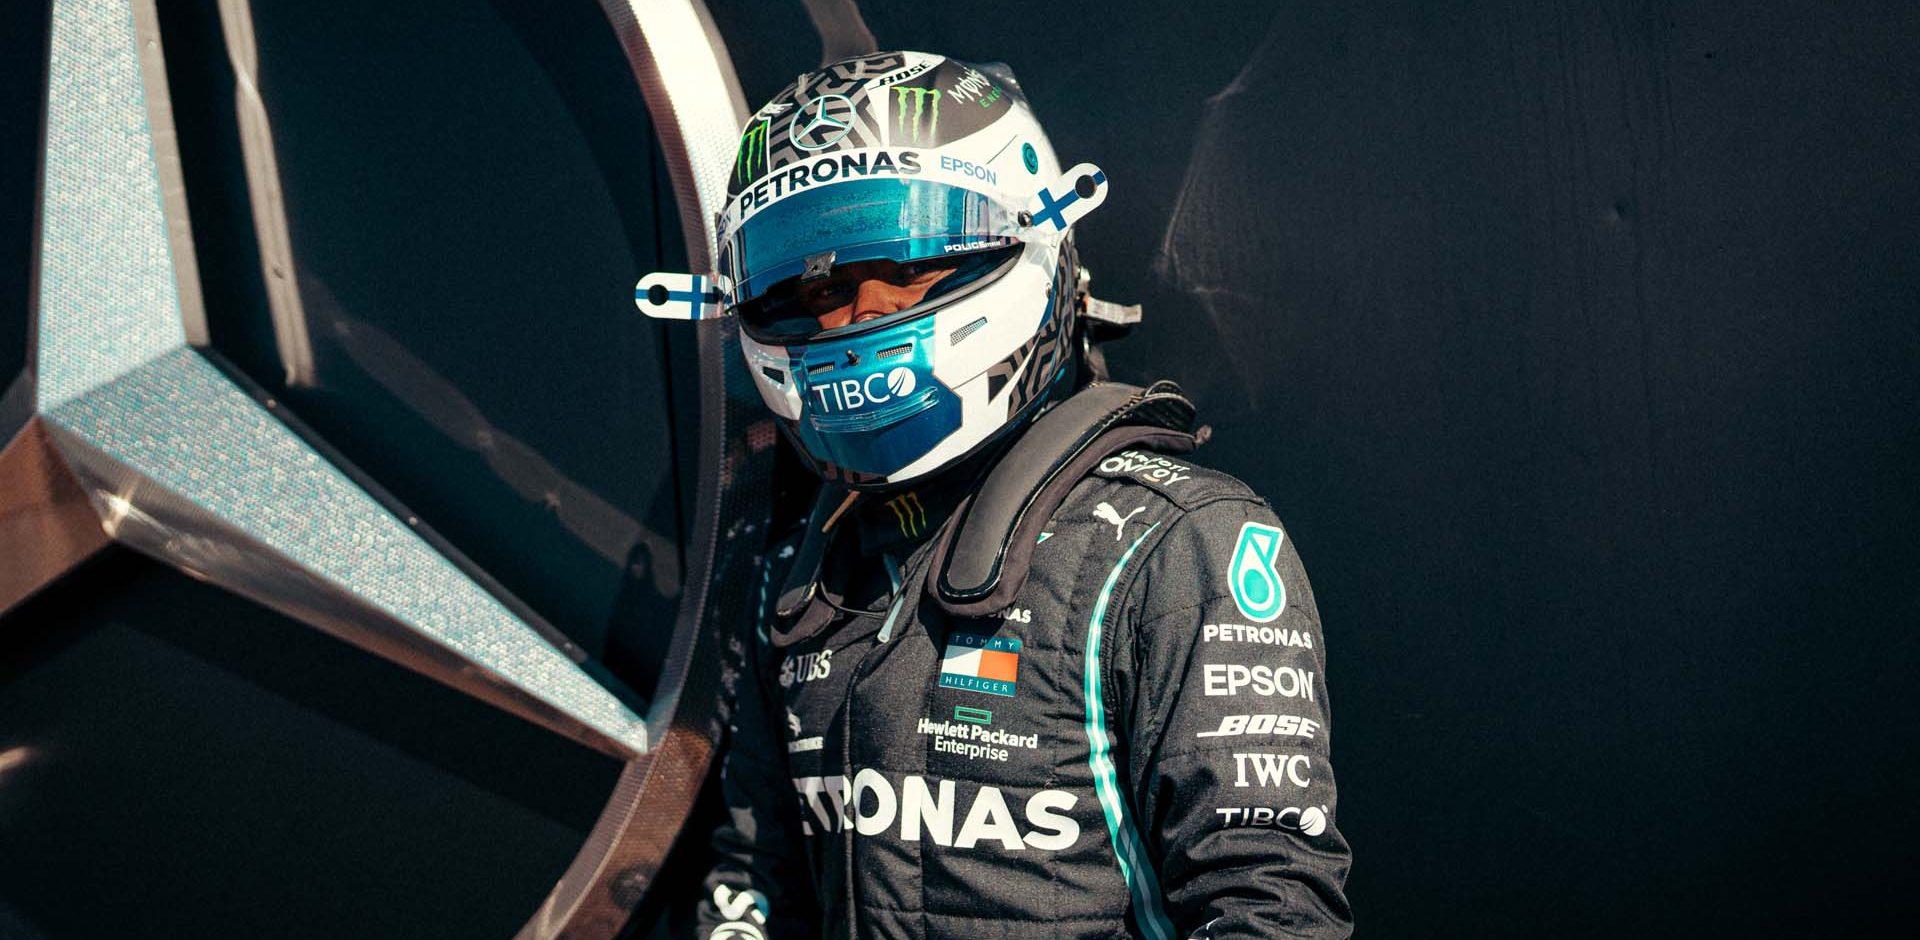 2020 Portuguese Grand Prix, Friday - Sebastian Kawka Valtteri Bottas Mercedes